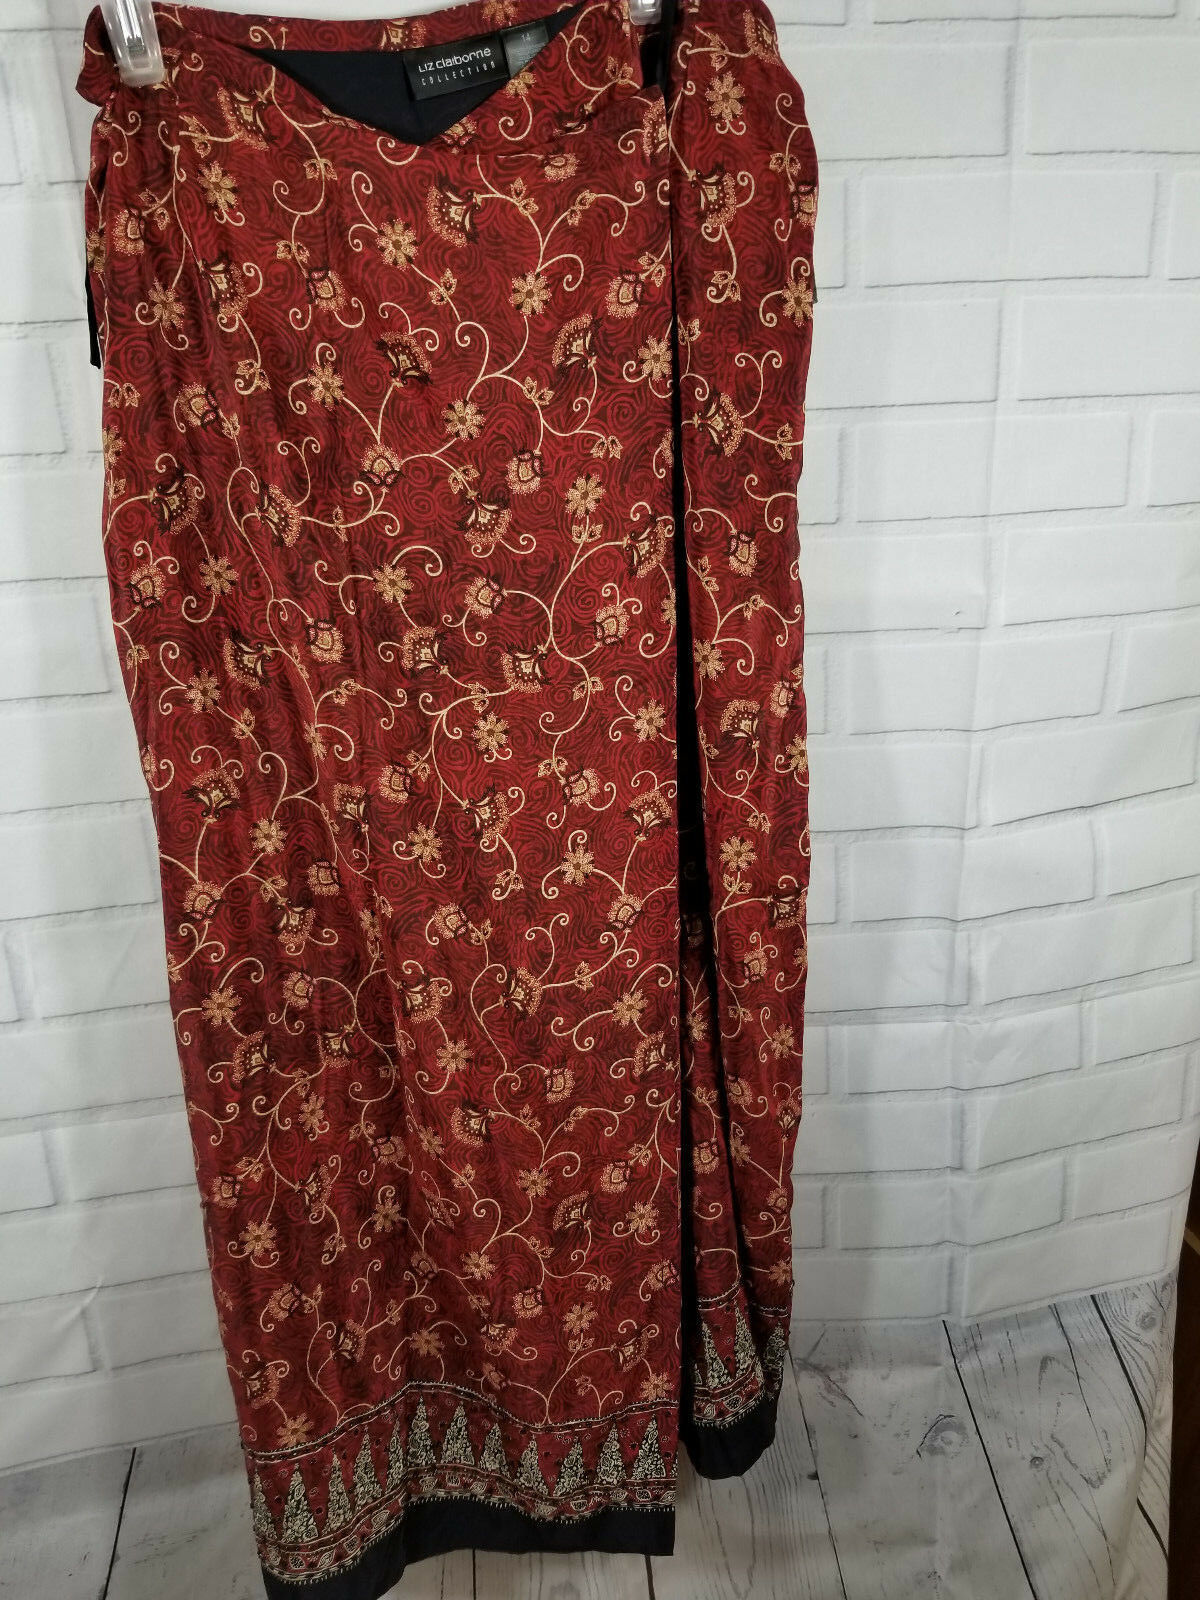 NWT Liz Claiborne Skirt Size 14 100% Silk Faux Wrap Burgundy Floral Print  109